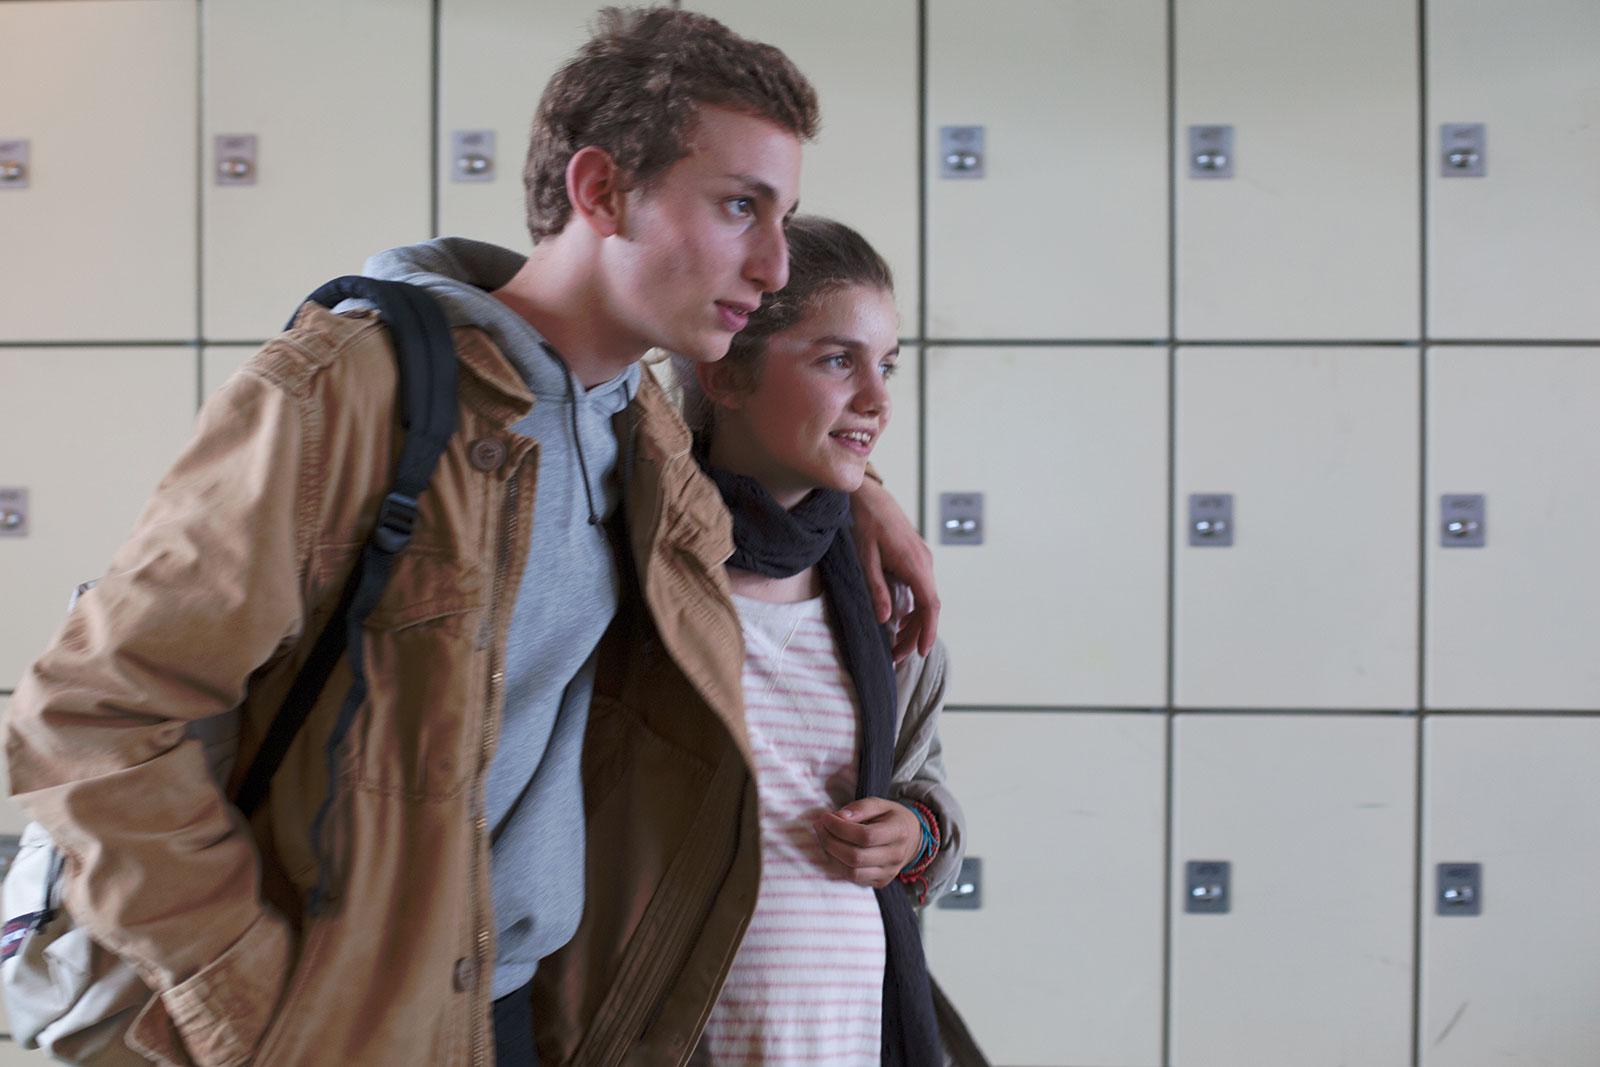 Film adolescent franais : tous les films adolescents